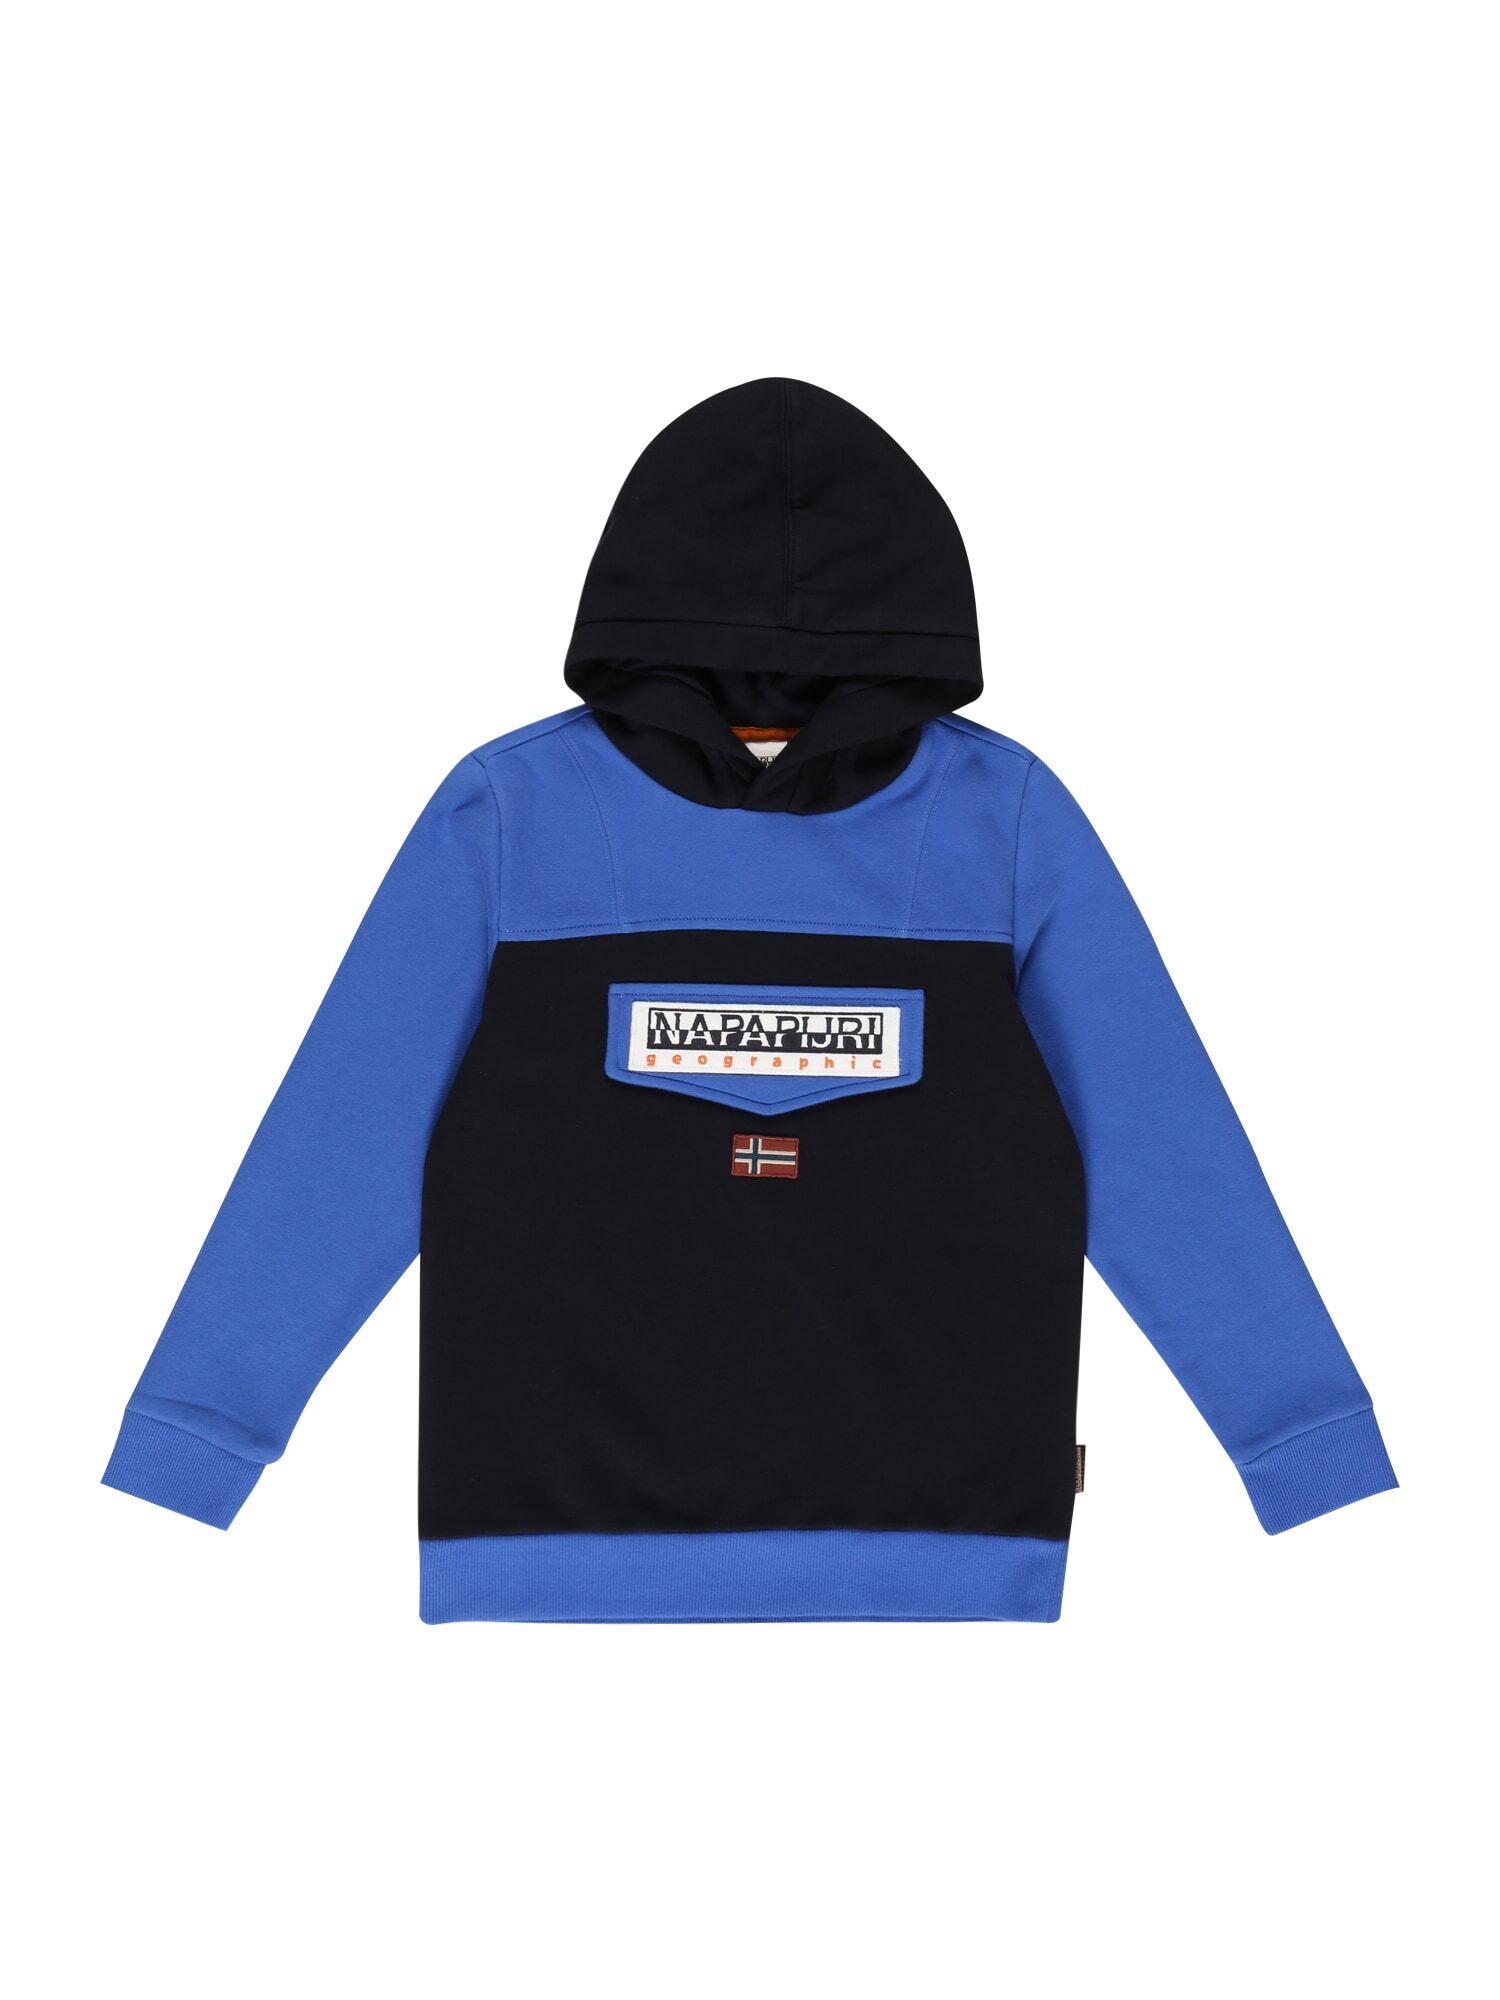 NAPAPIJRI Sweat-shirt 'BURGEE'  - Bleu - Taille: 6 - girl